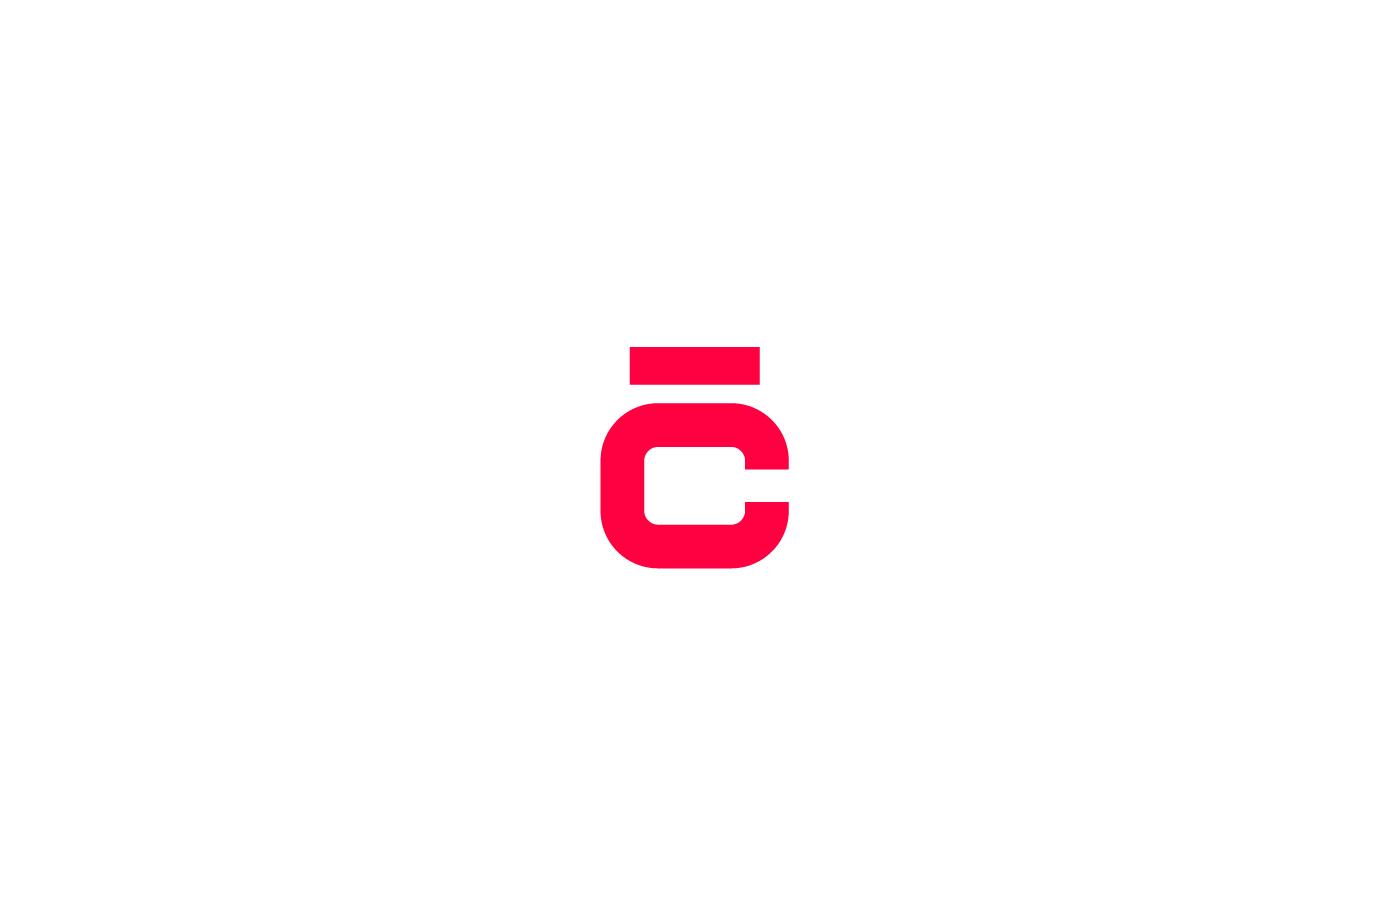 logos_2015-16-06.jpg